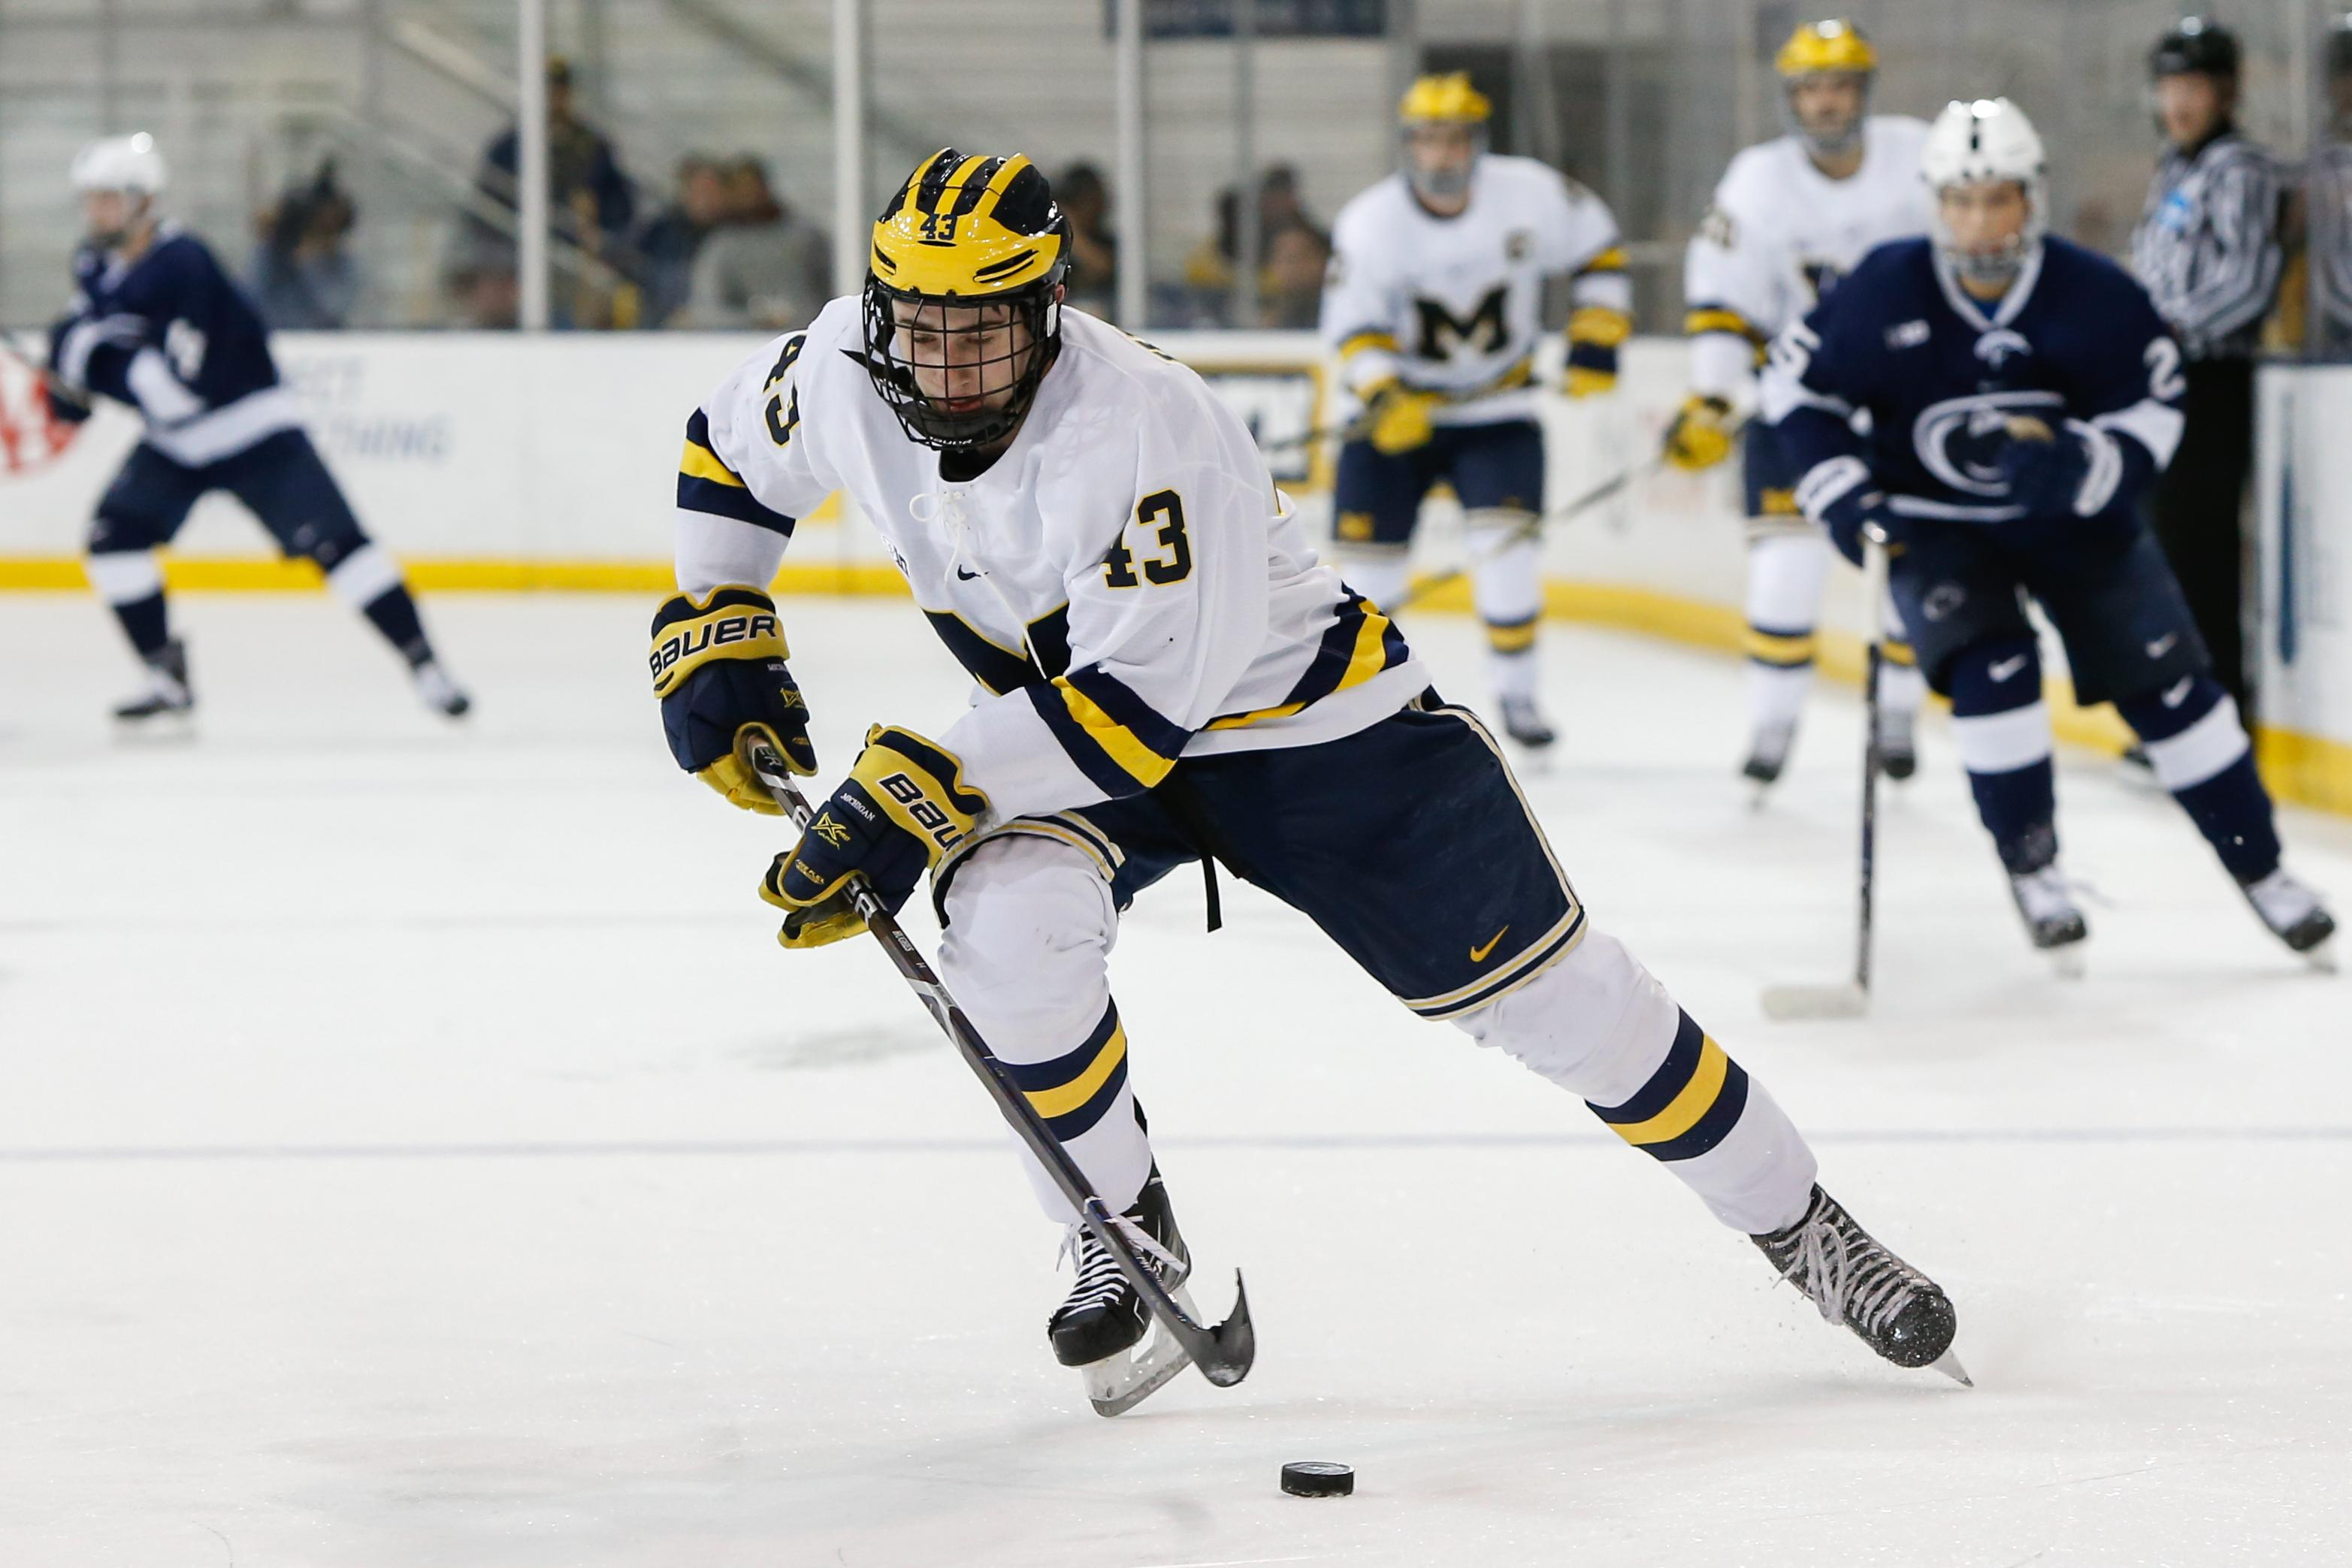 COLLEGE HOCKEY: JAN 19 Penn State at Michigan